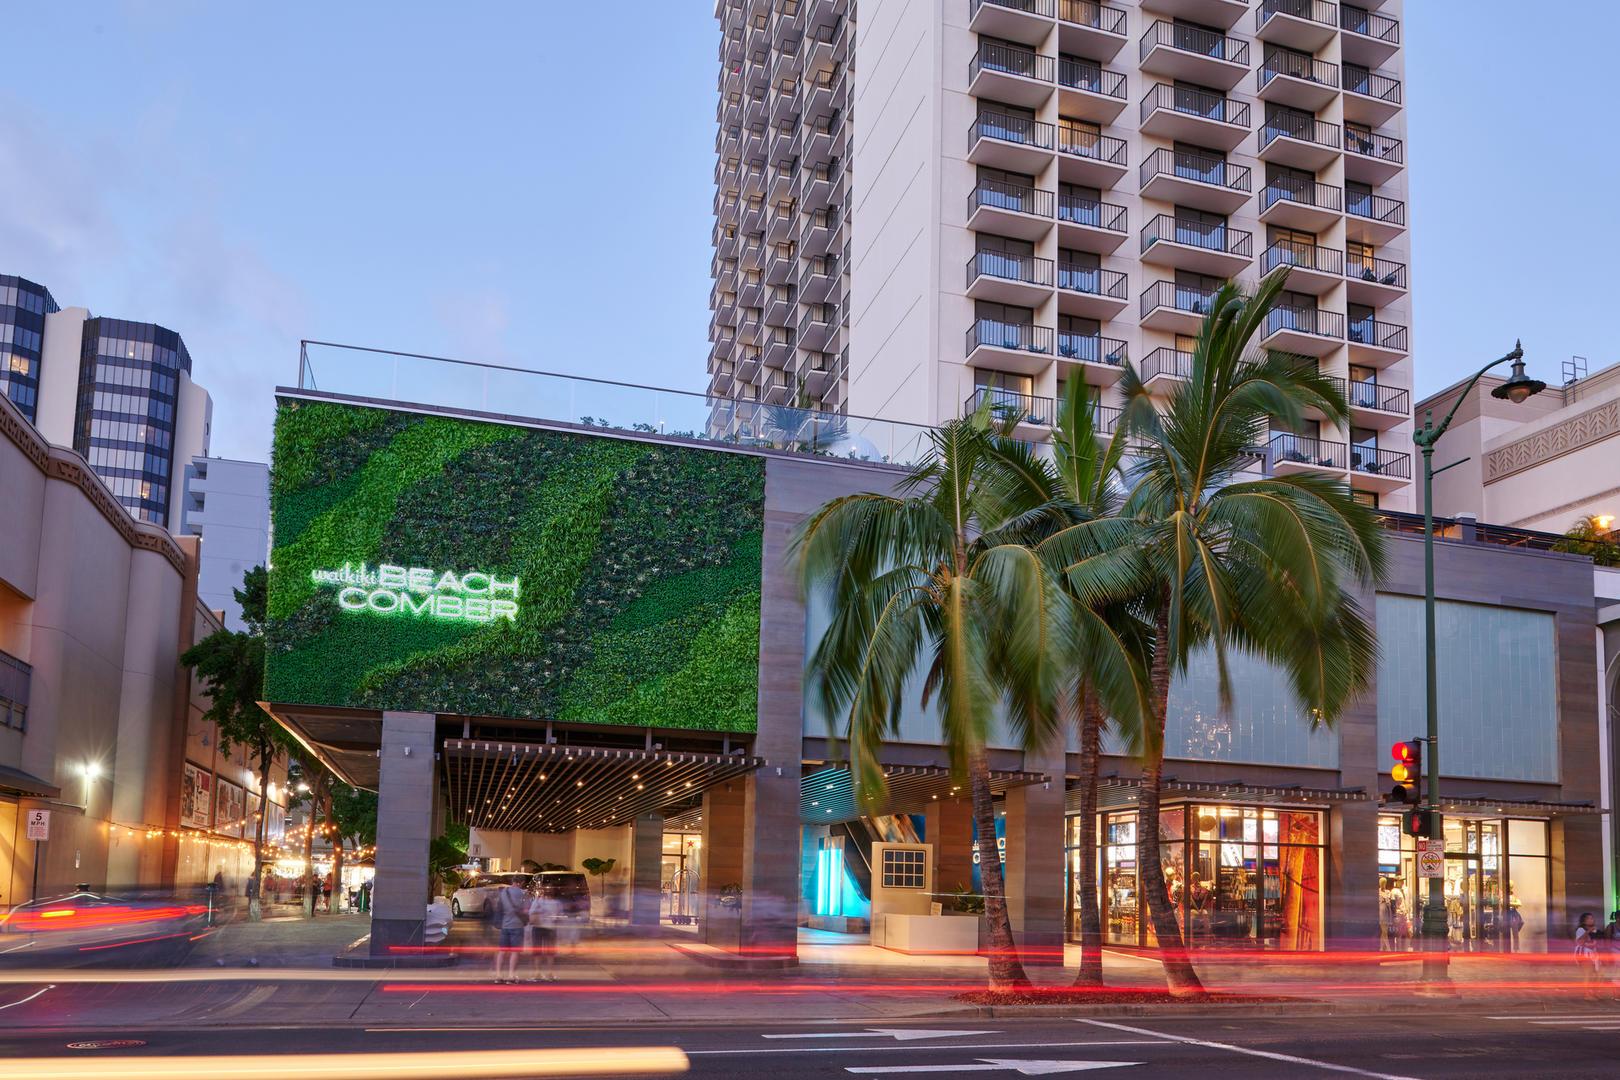 Waikiki Beachcomber By Outrigger Gha